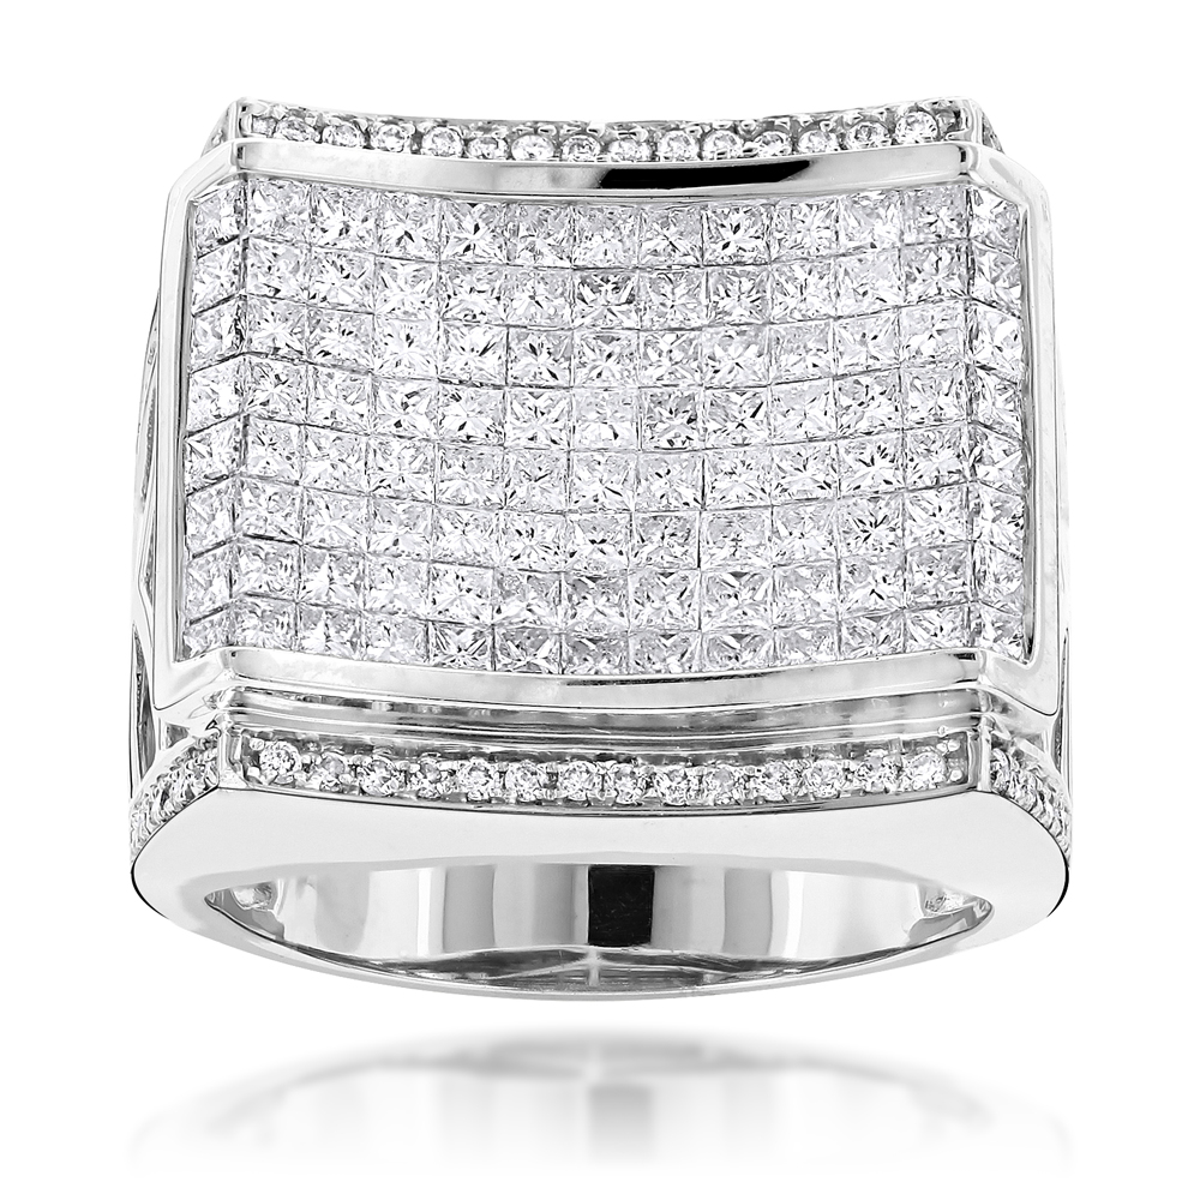 Designer Jewelry for Men: Round Princess Cut Diamond Ring 4.34ct 14K